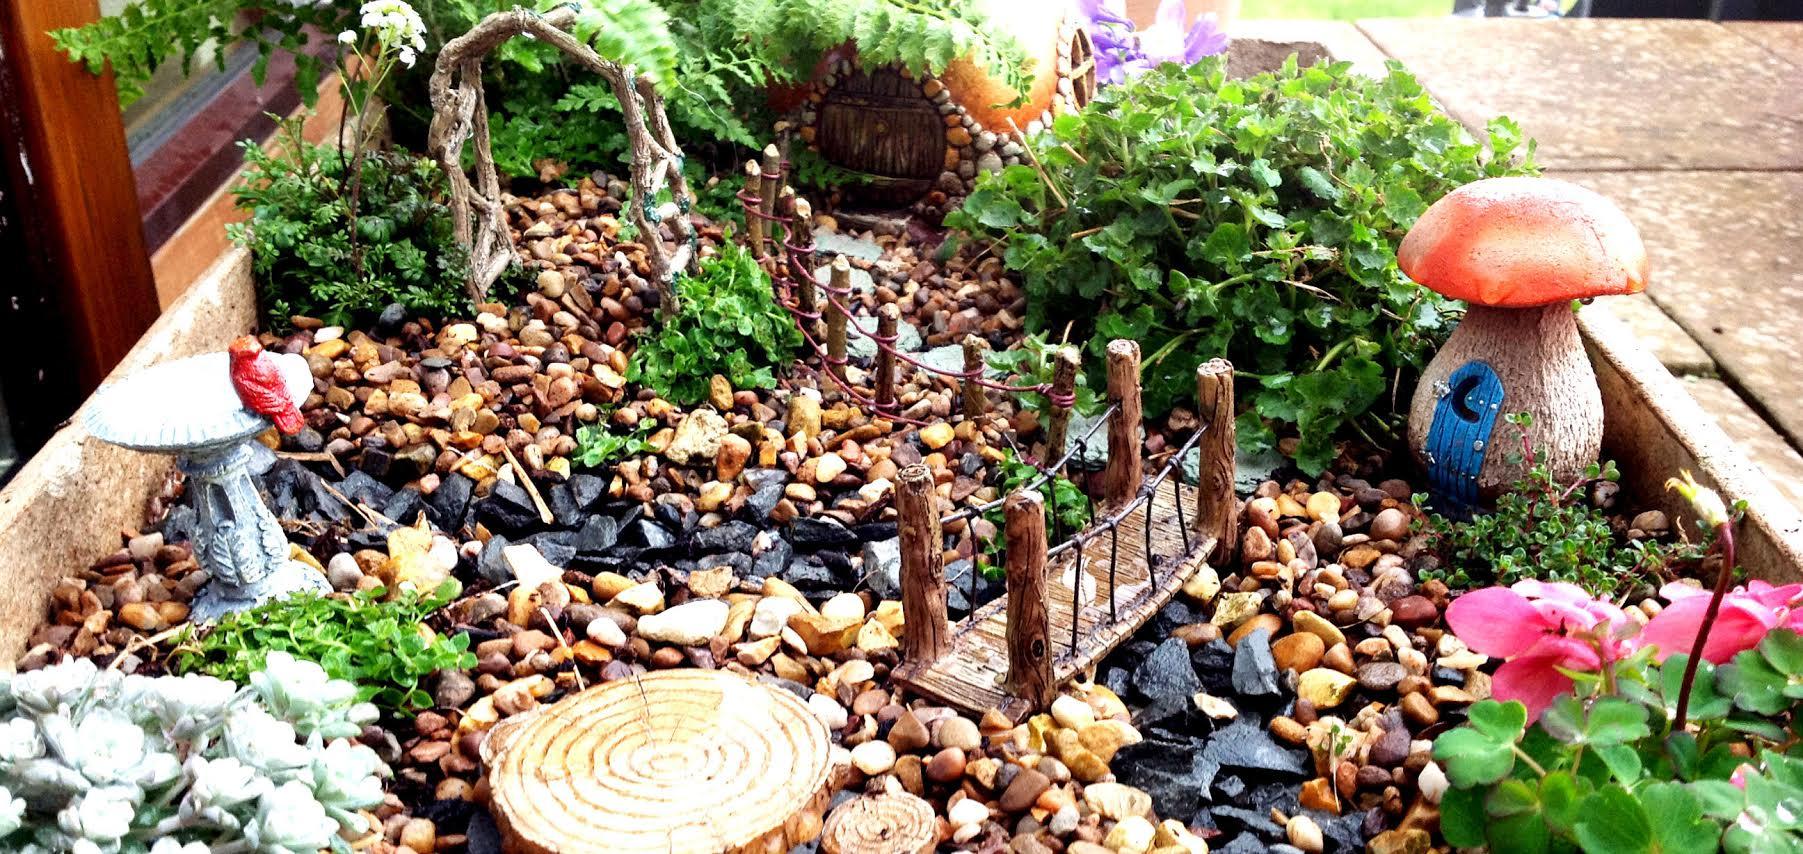 Fairytale Gardens Pentland Plants News